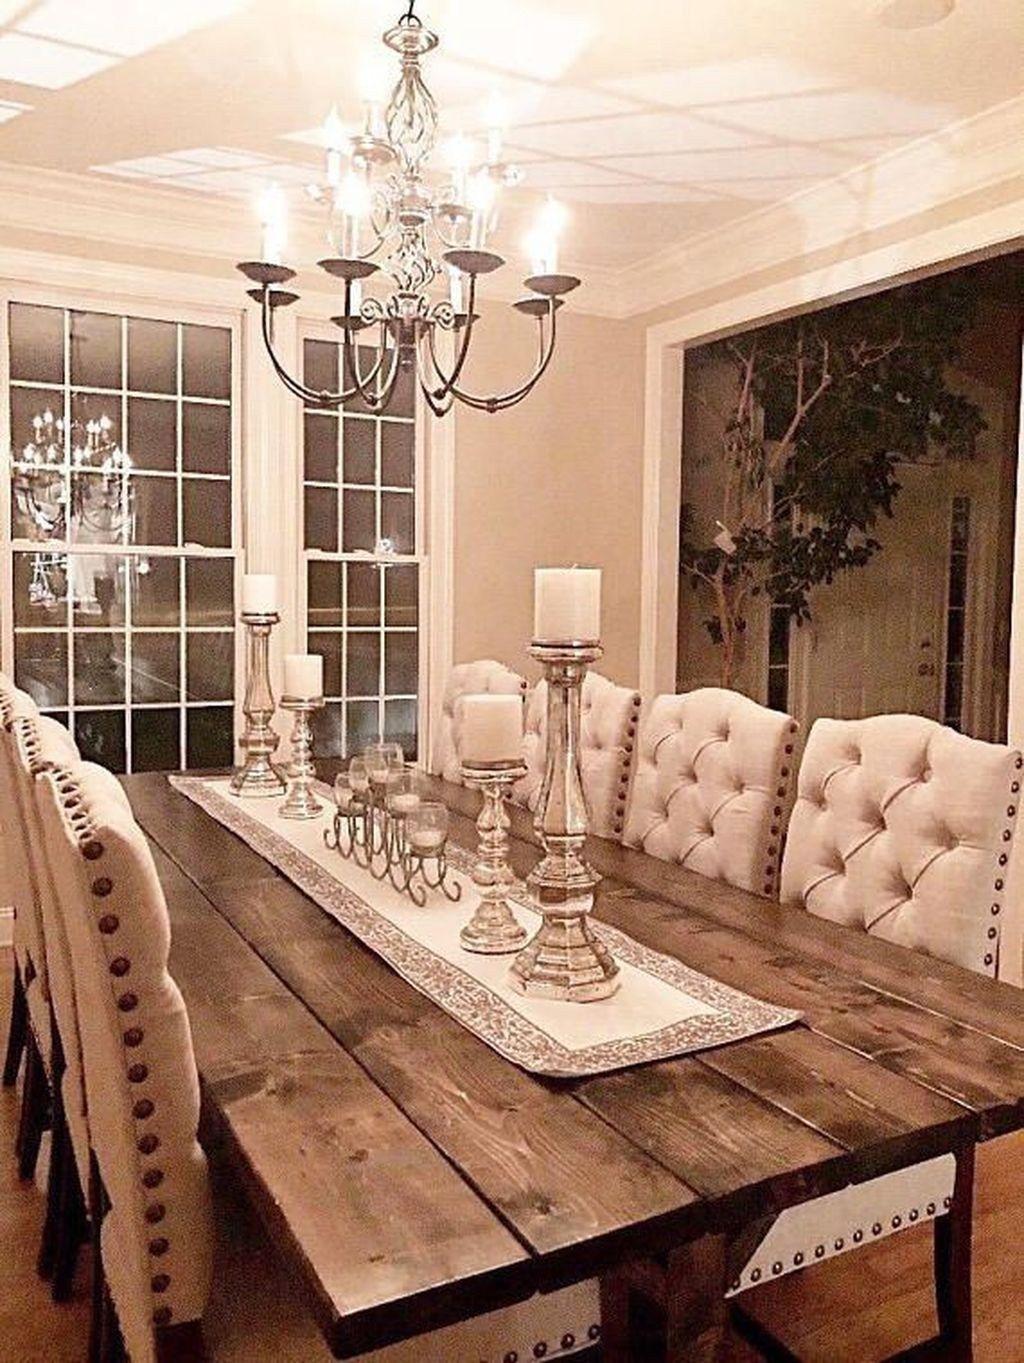 Rustic Farmhouse Living Room Decor Ideas 44 Farmhouse Dining